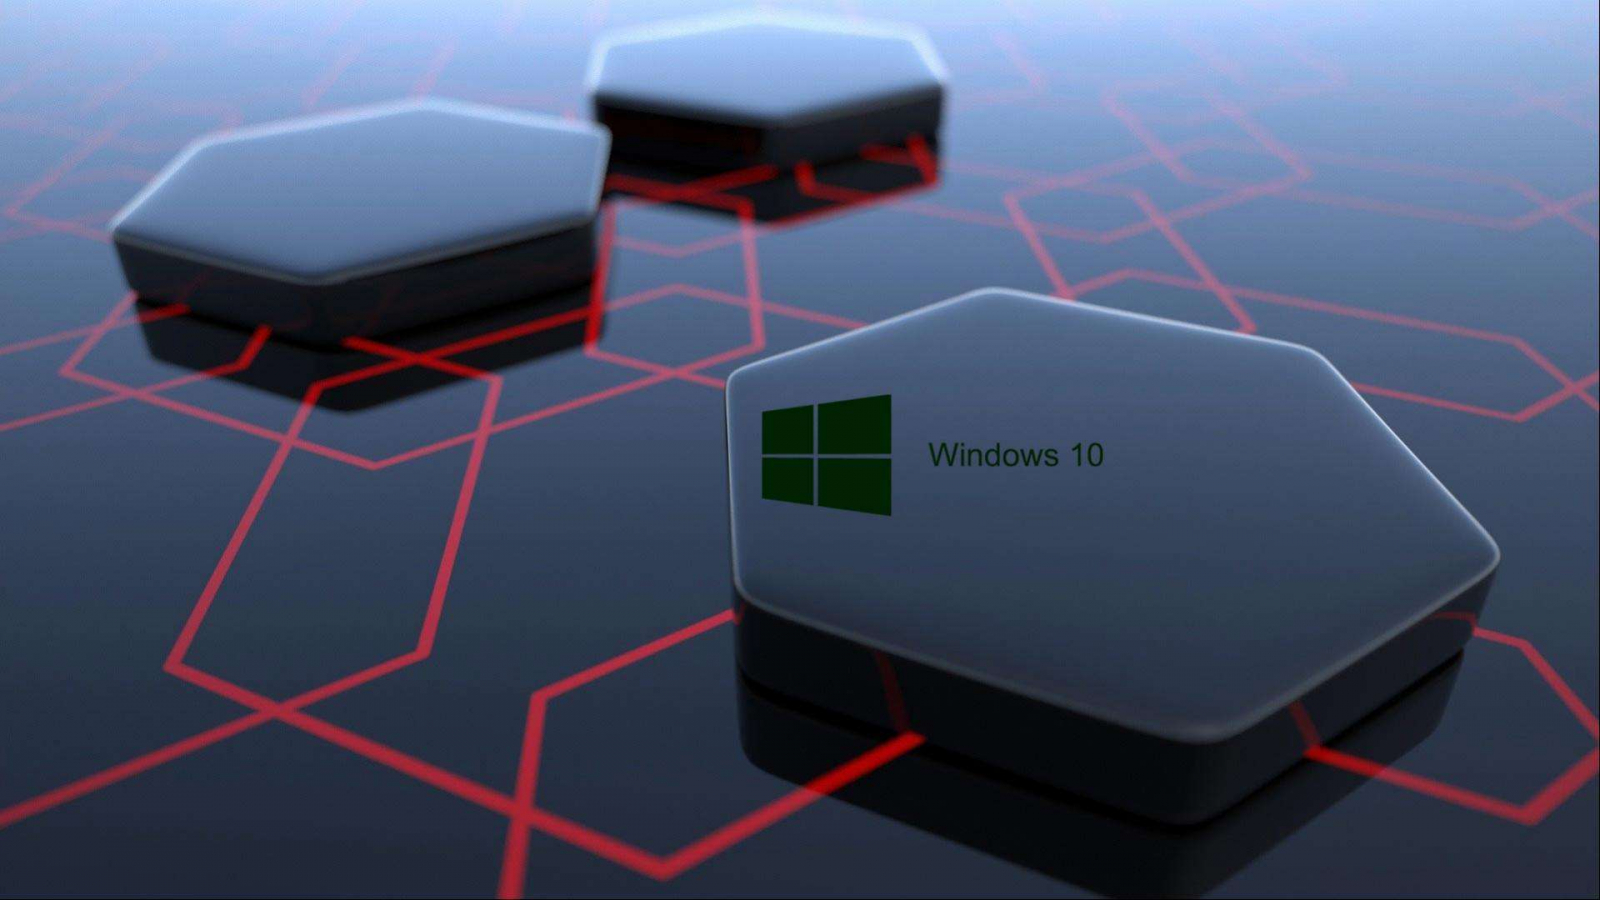 Free Download Wallpaper Windows 10 Wallpaper Hd 1080p Upload At